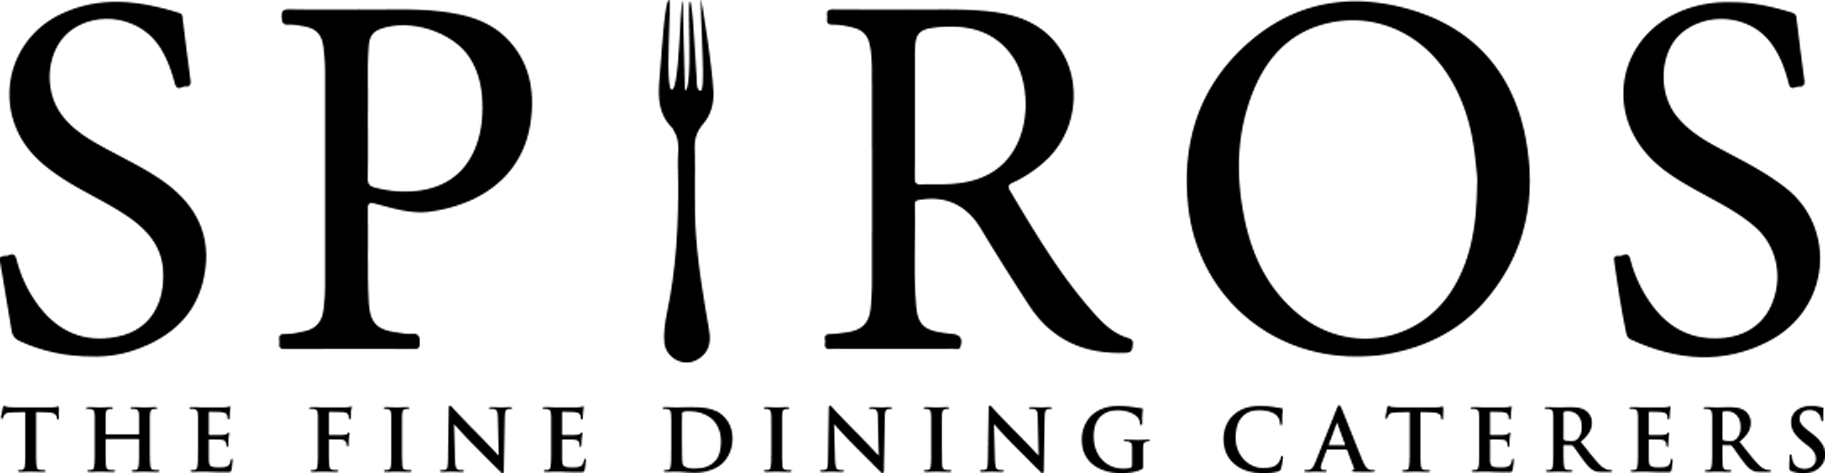 Spiros